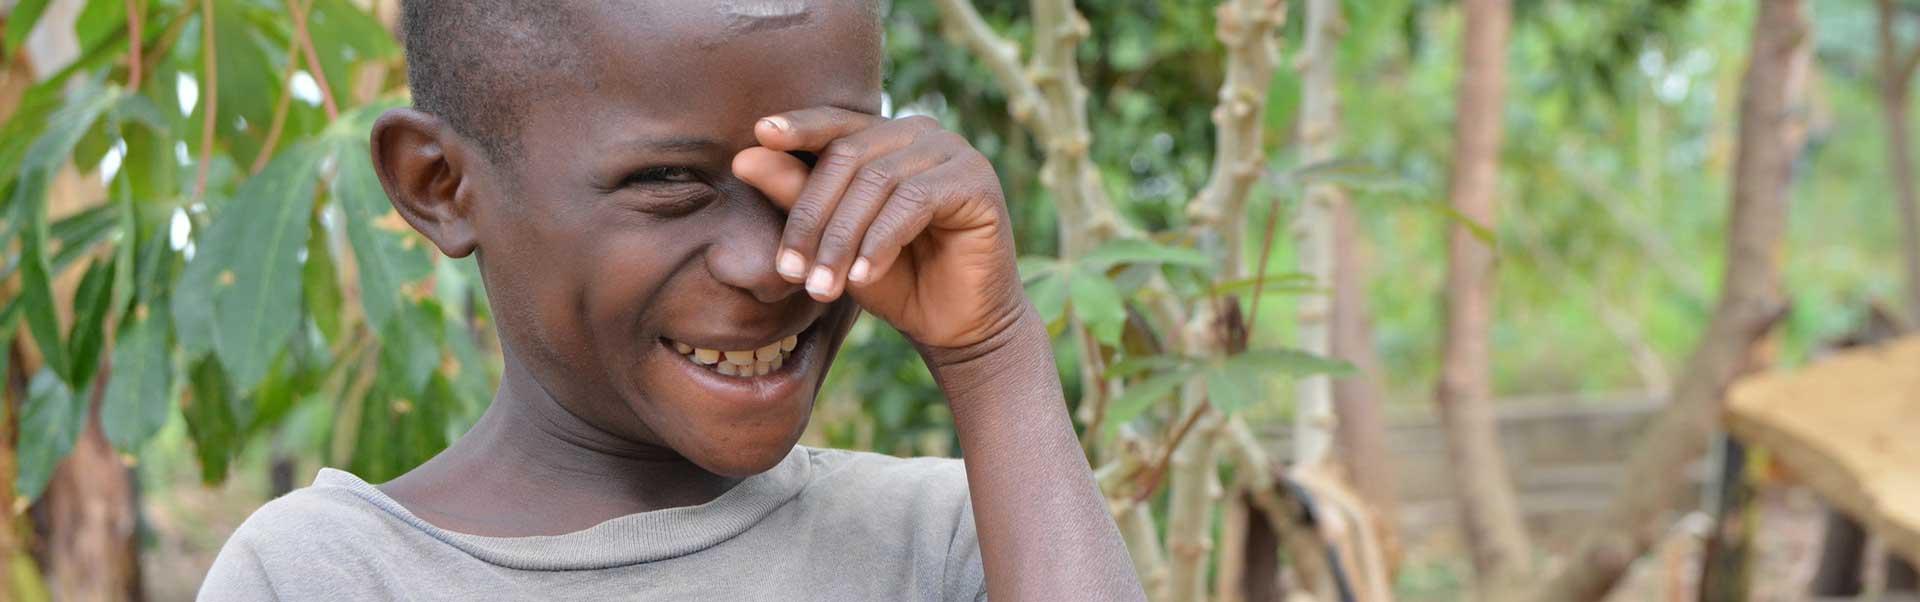 10-year-old Mathias from Uganda has cataracts in both eyes.